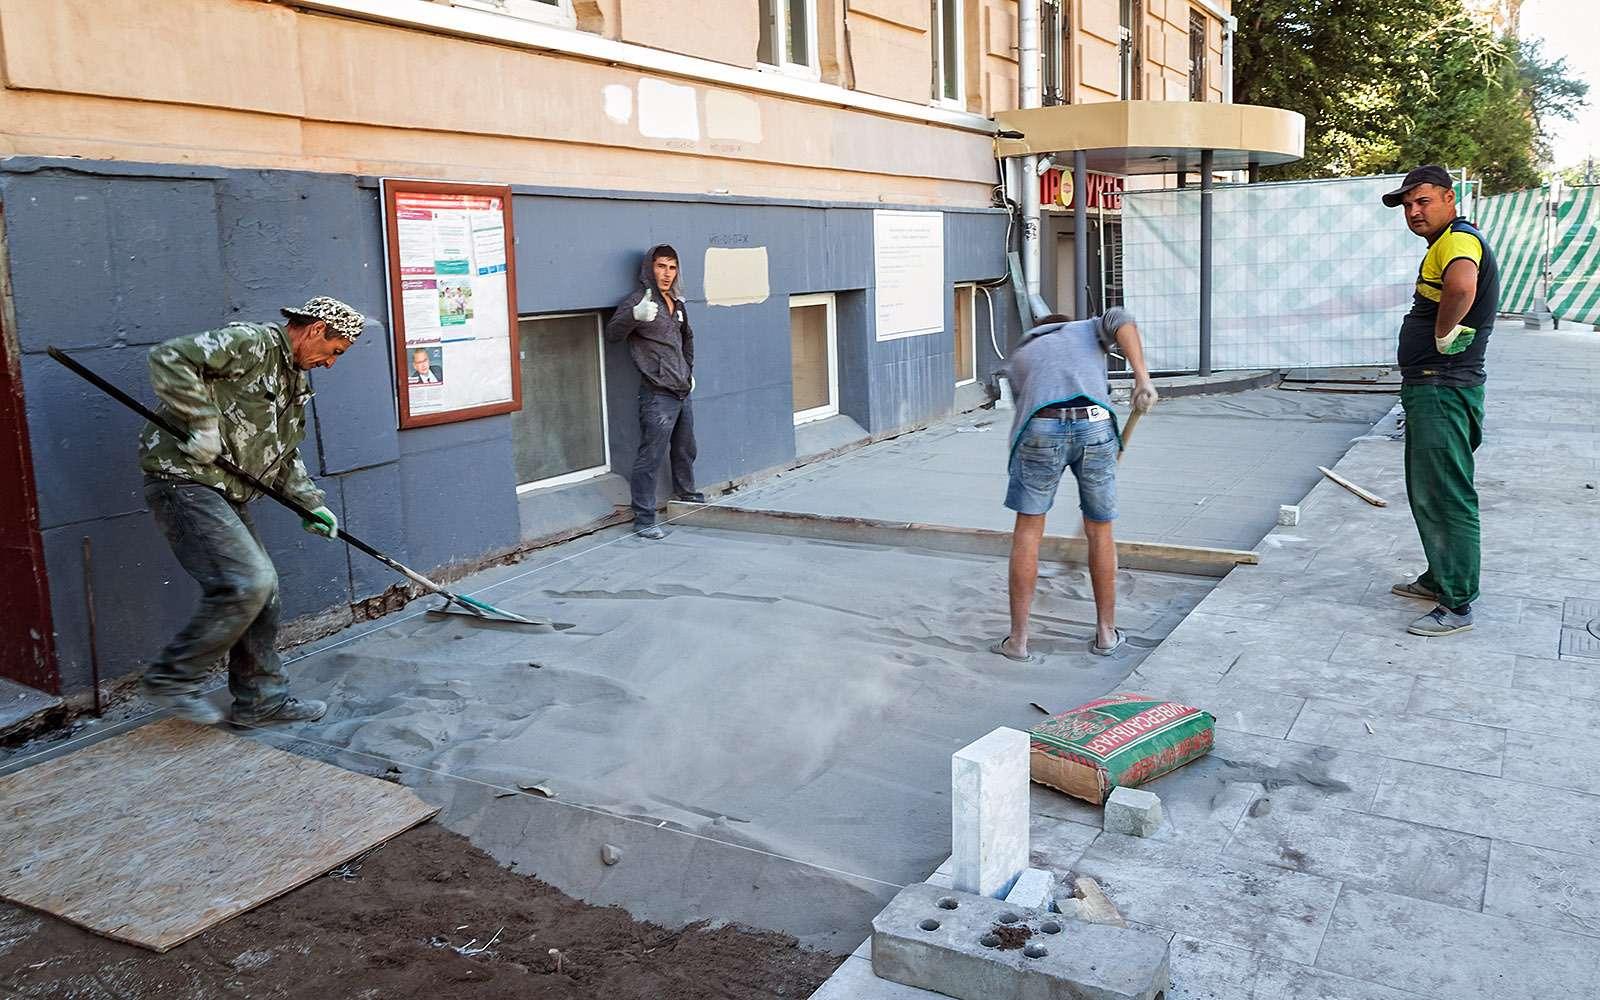 Гастарбайтеры укладывают тротуарную плитку